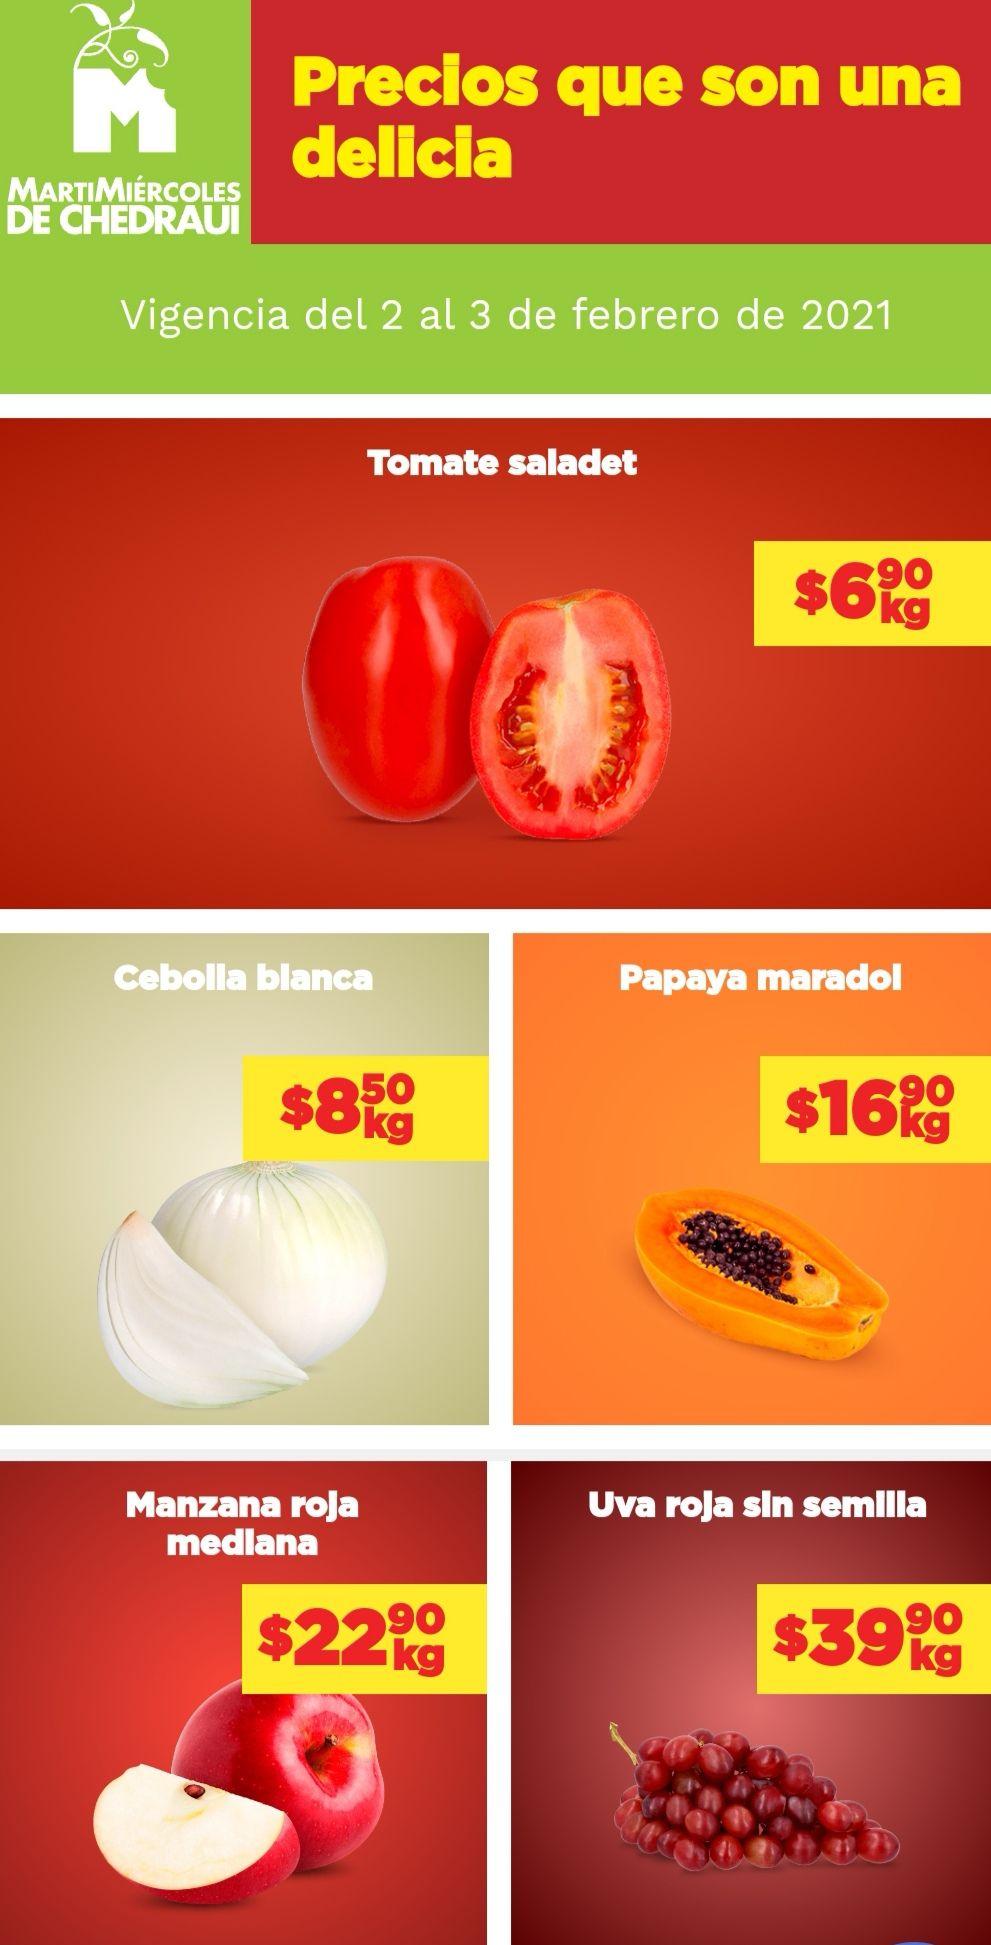 Chedraui: MartiMiércoles de Chedraui 2 y 3 Febrero: Jitomate $6.90 kg... Cebolla $8.50 kg... Papaya $16.90 kg... Manzana Roja $22.90 kg.